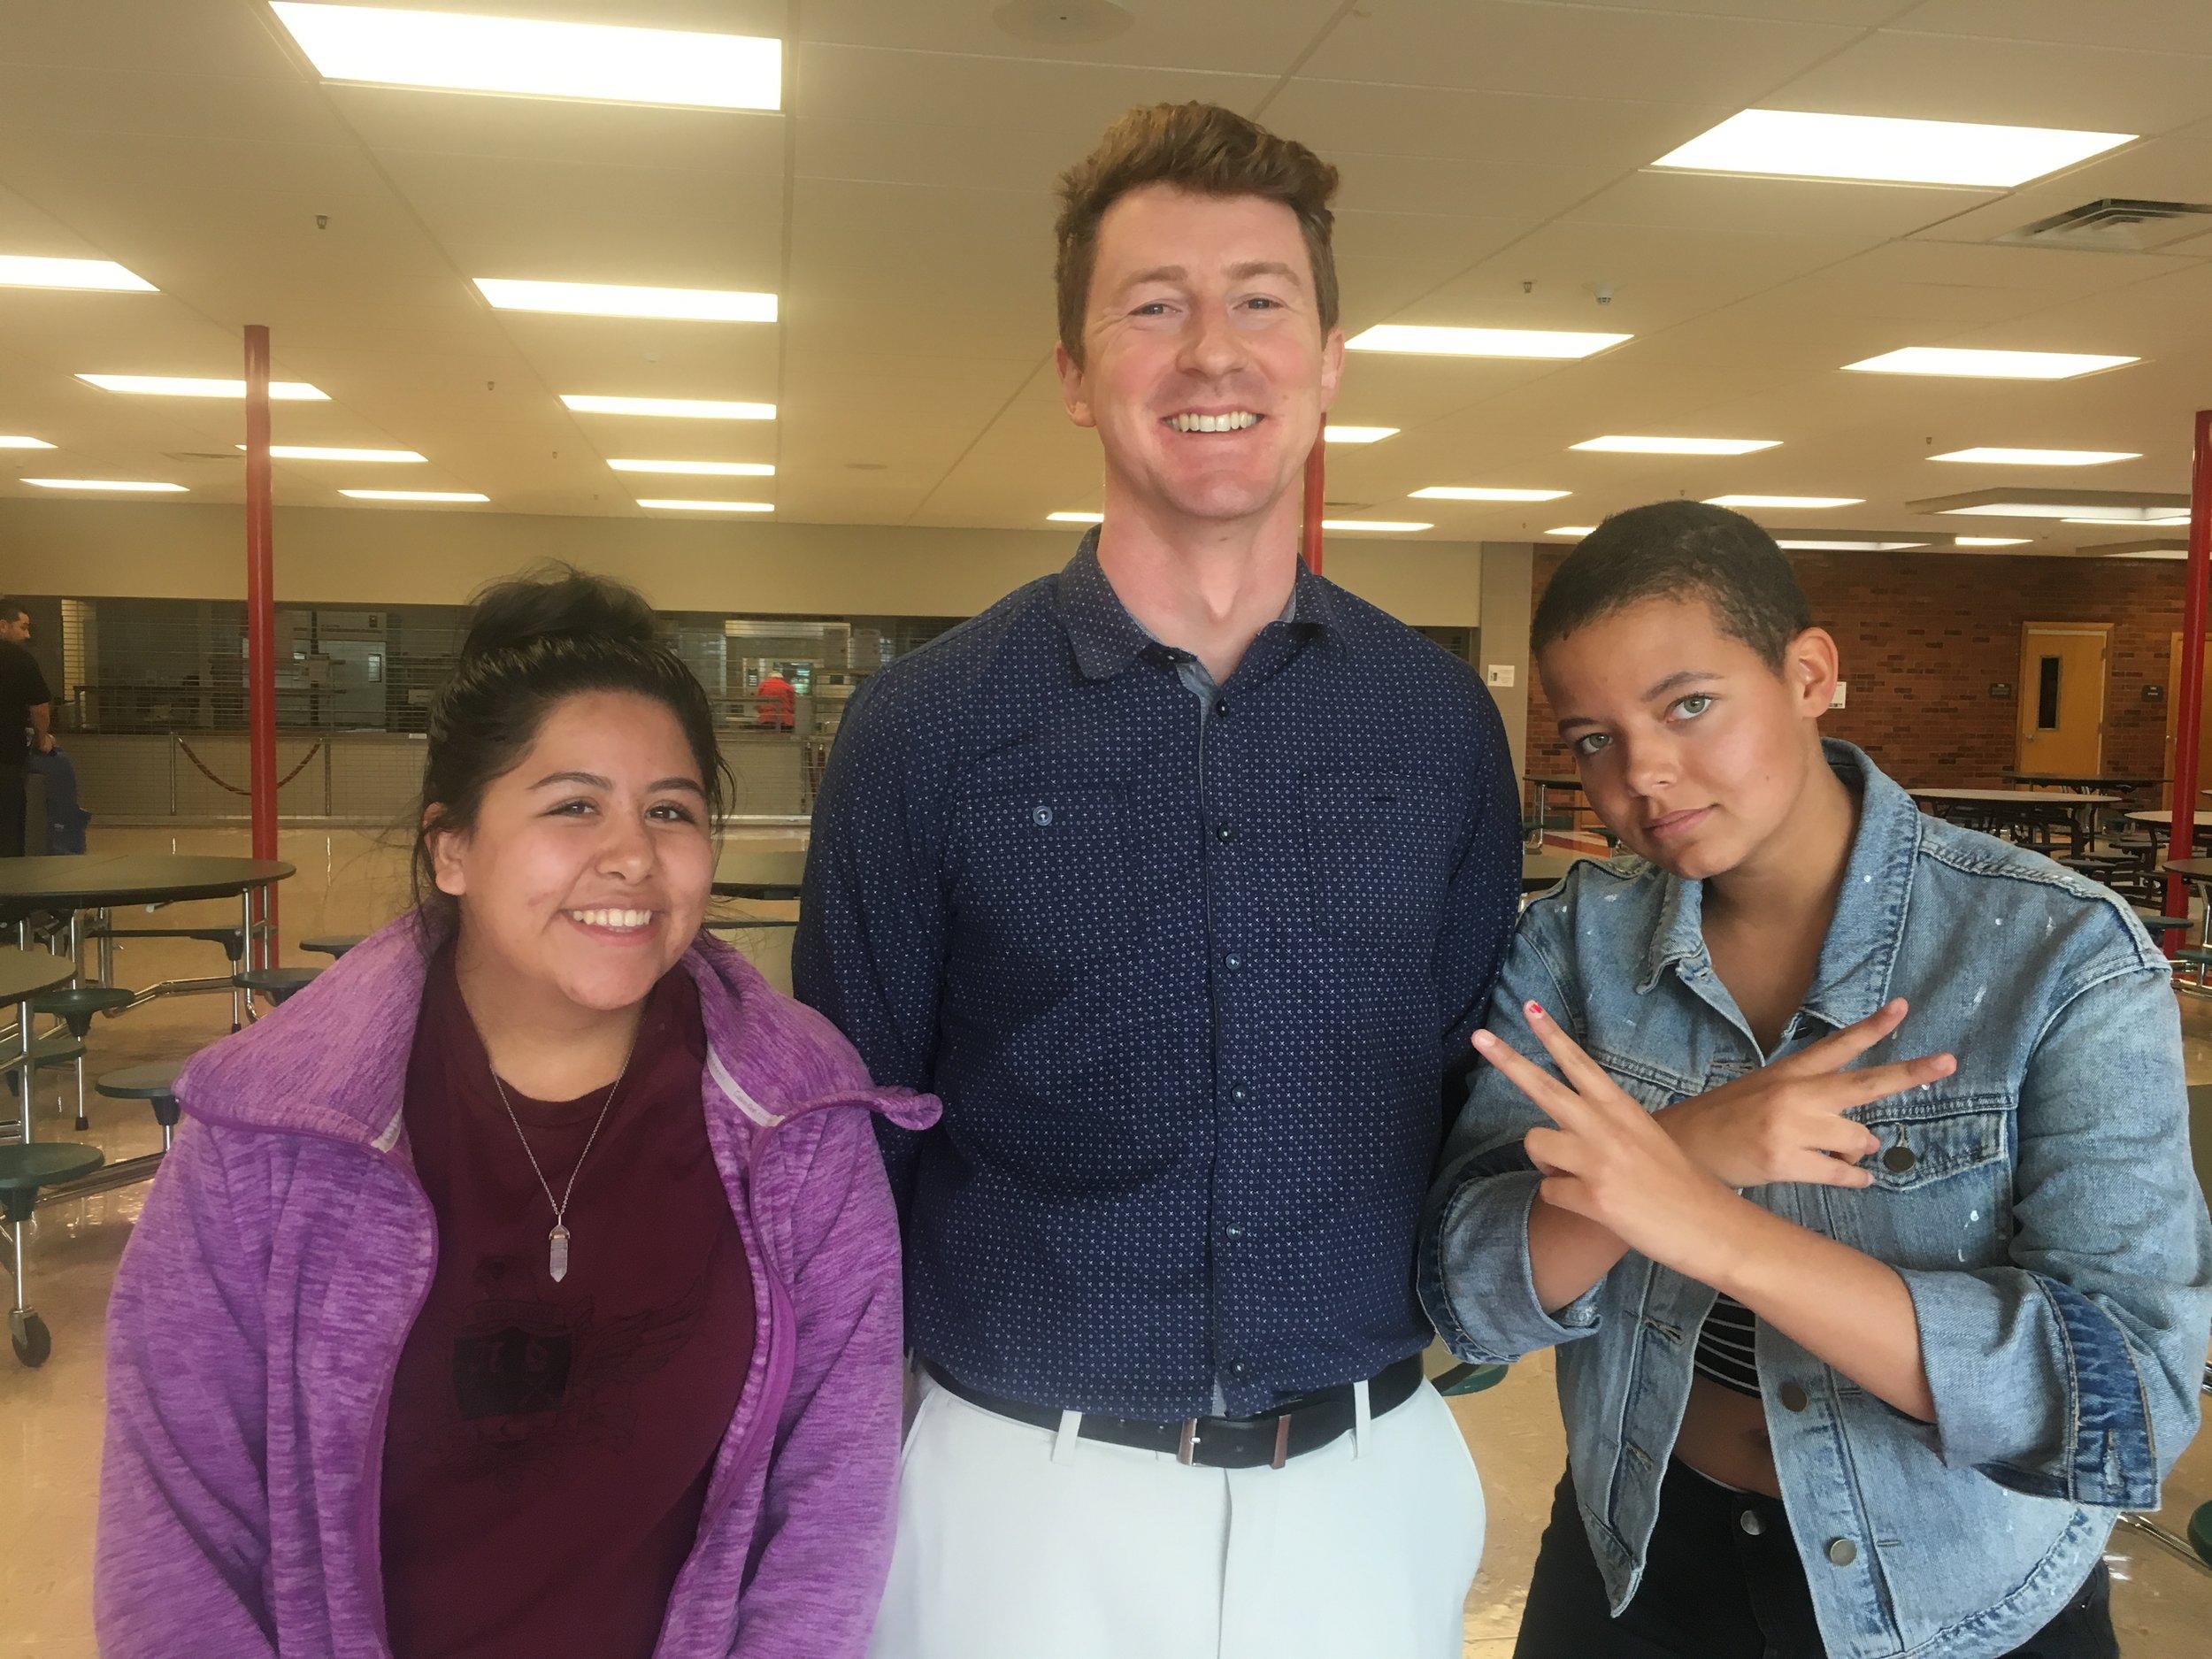 Elizabeth, Mr. Crandall, and Daija.